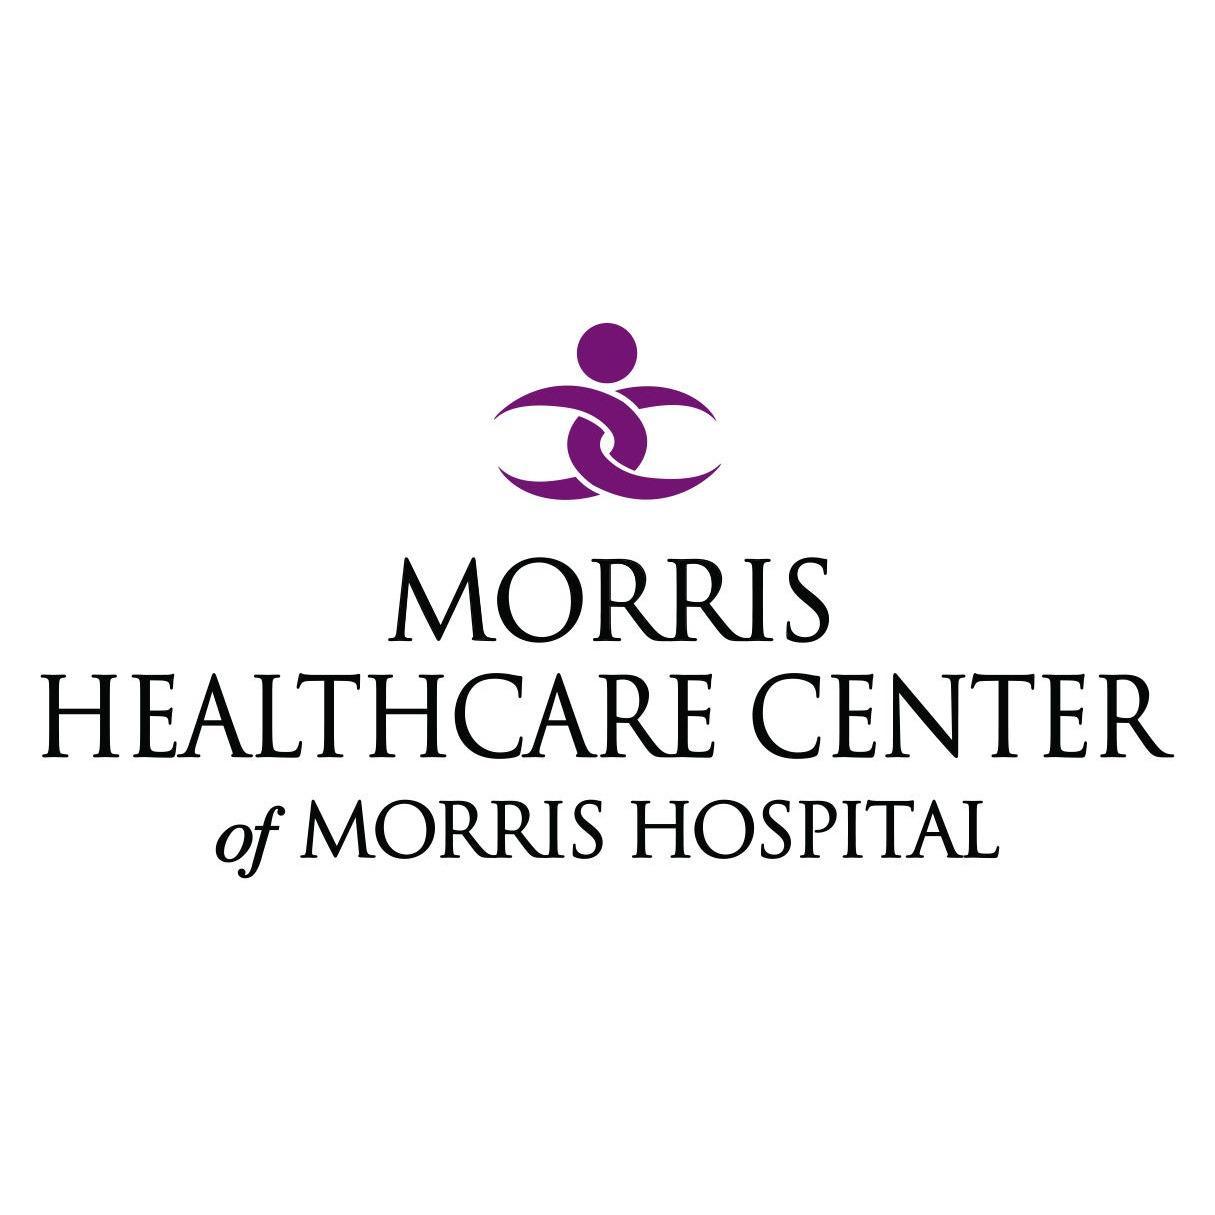 Morris Healthcare Center of Morris Hospital - Lakewood Drive